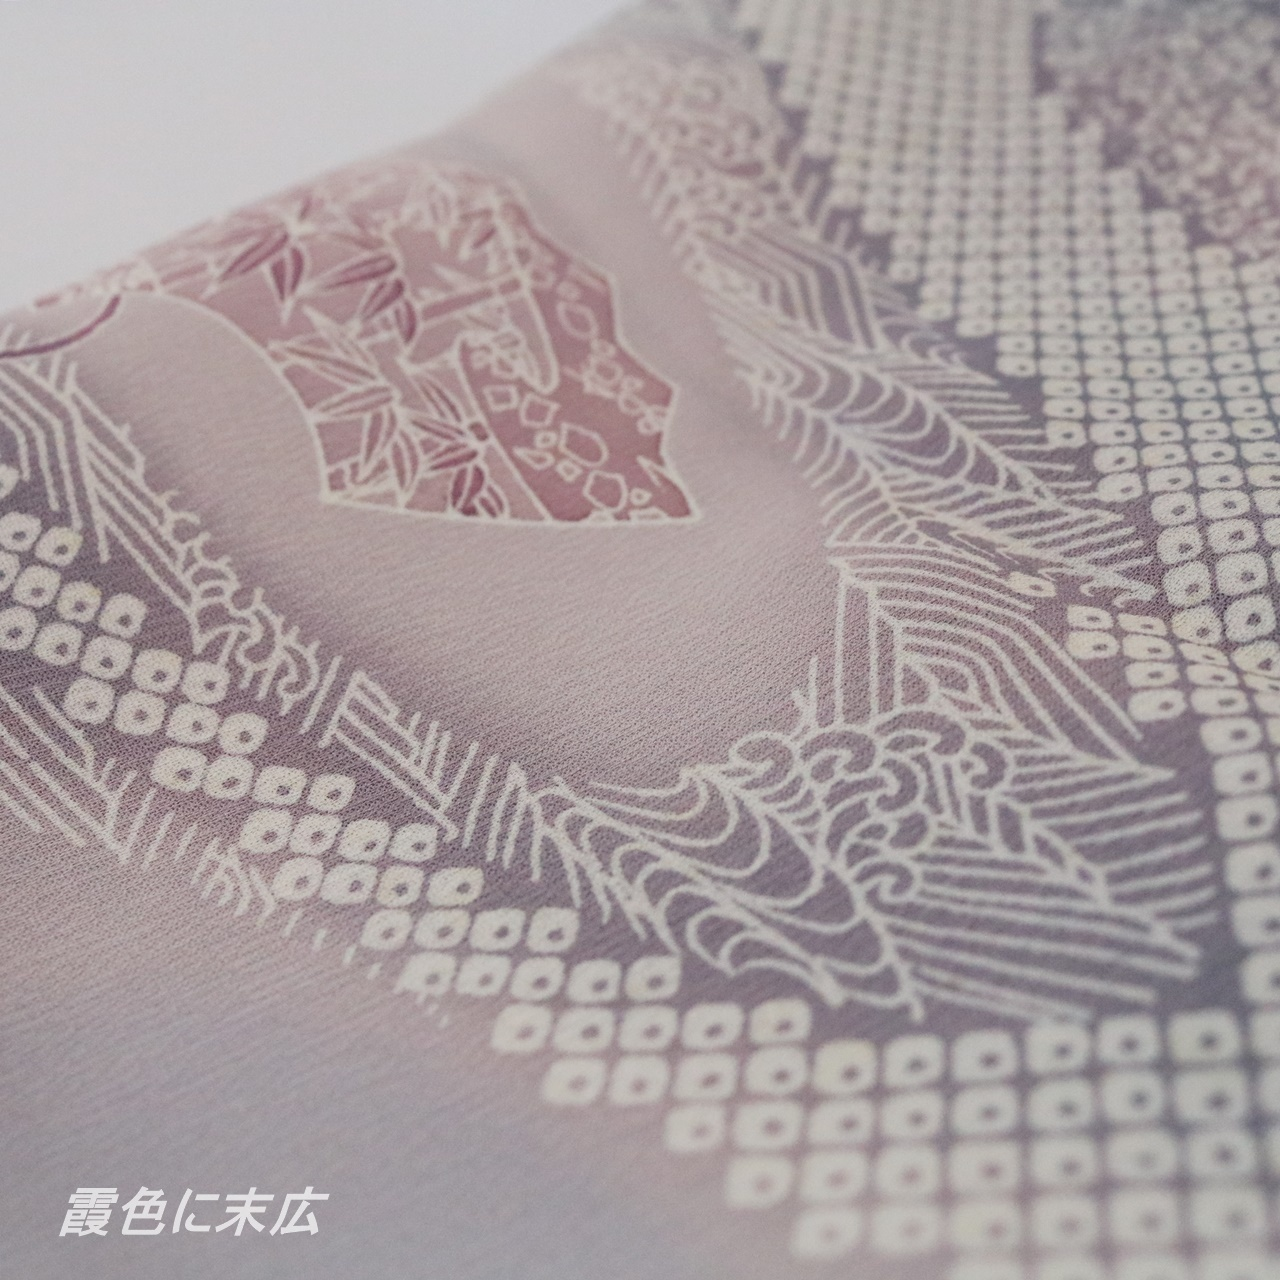 【N様ご予約品】きじばとや特製うそつき襦袢(替え袖+裾よけ) 霞色に末広